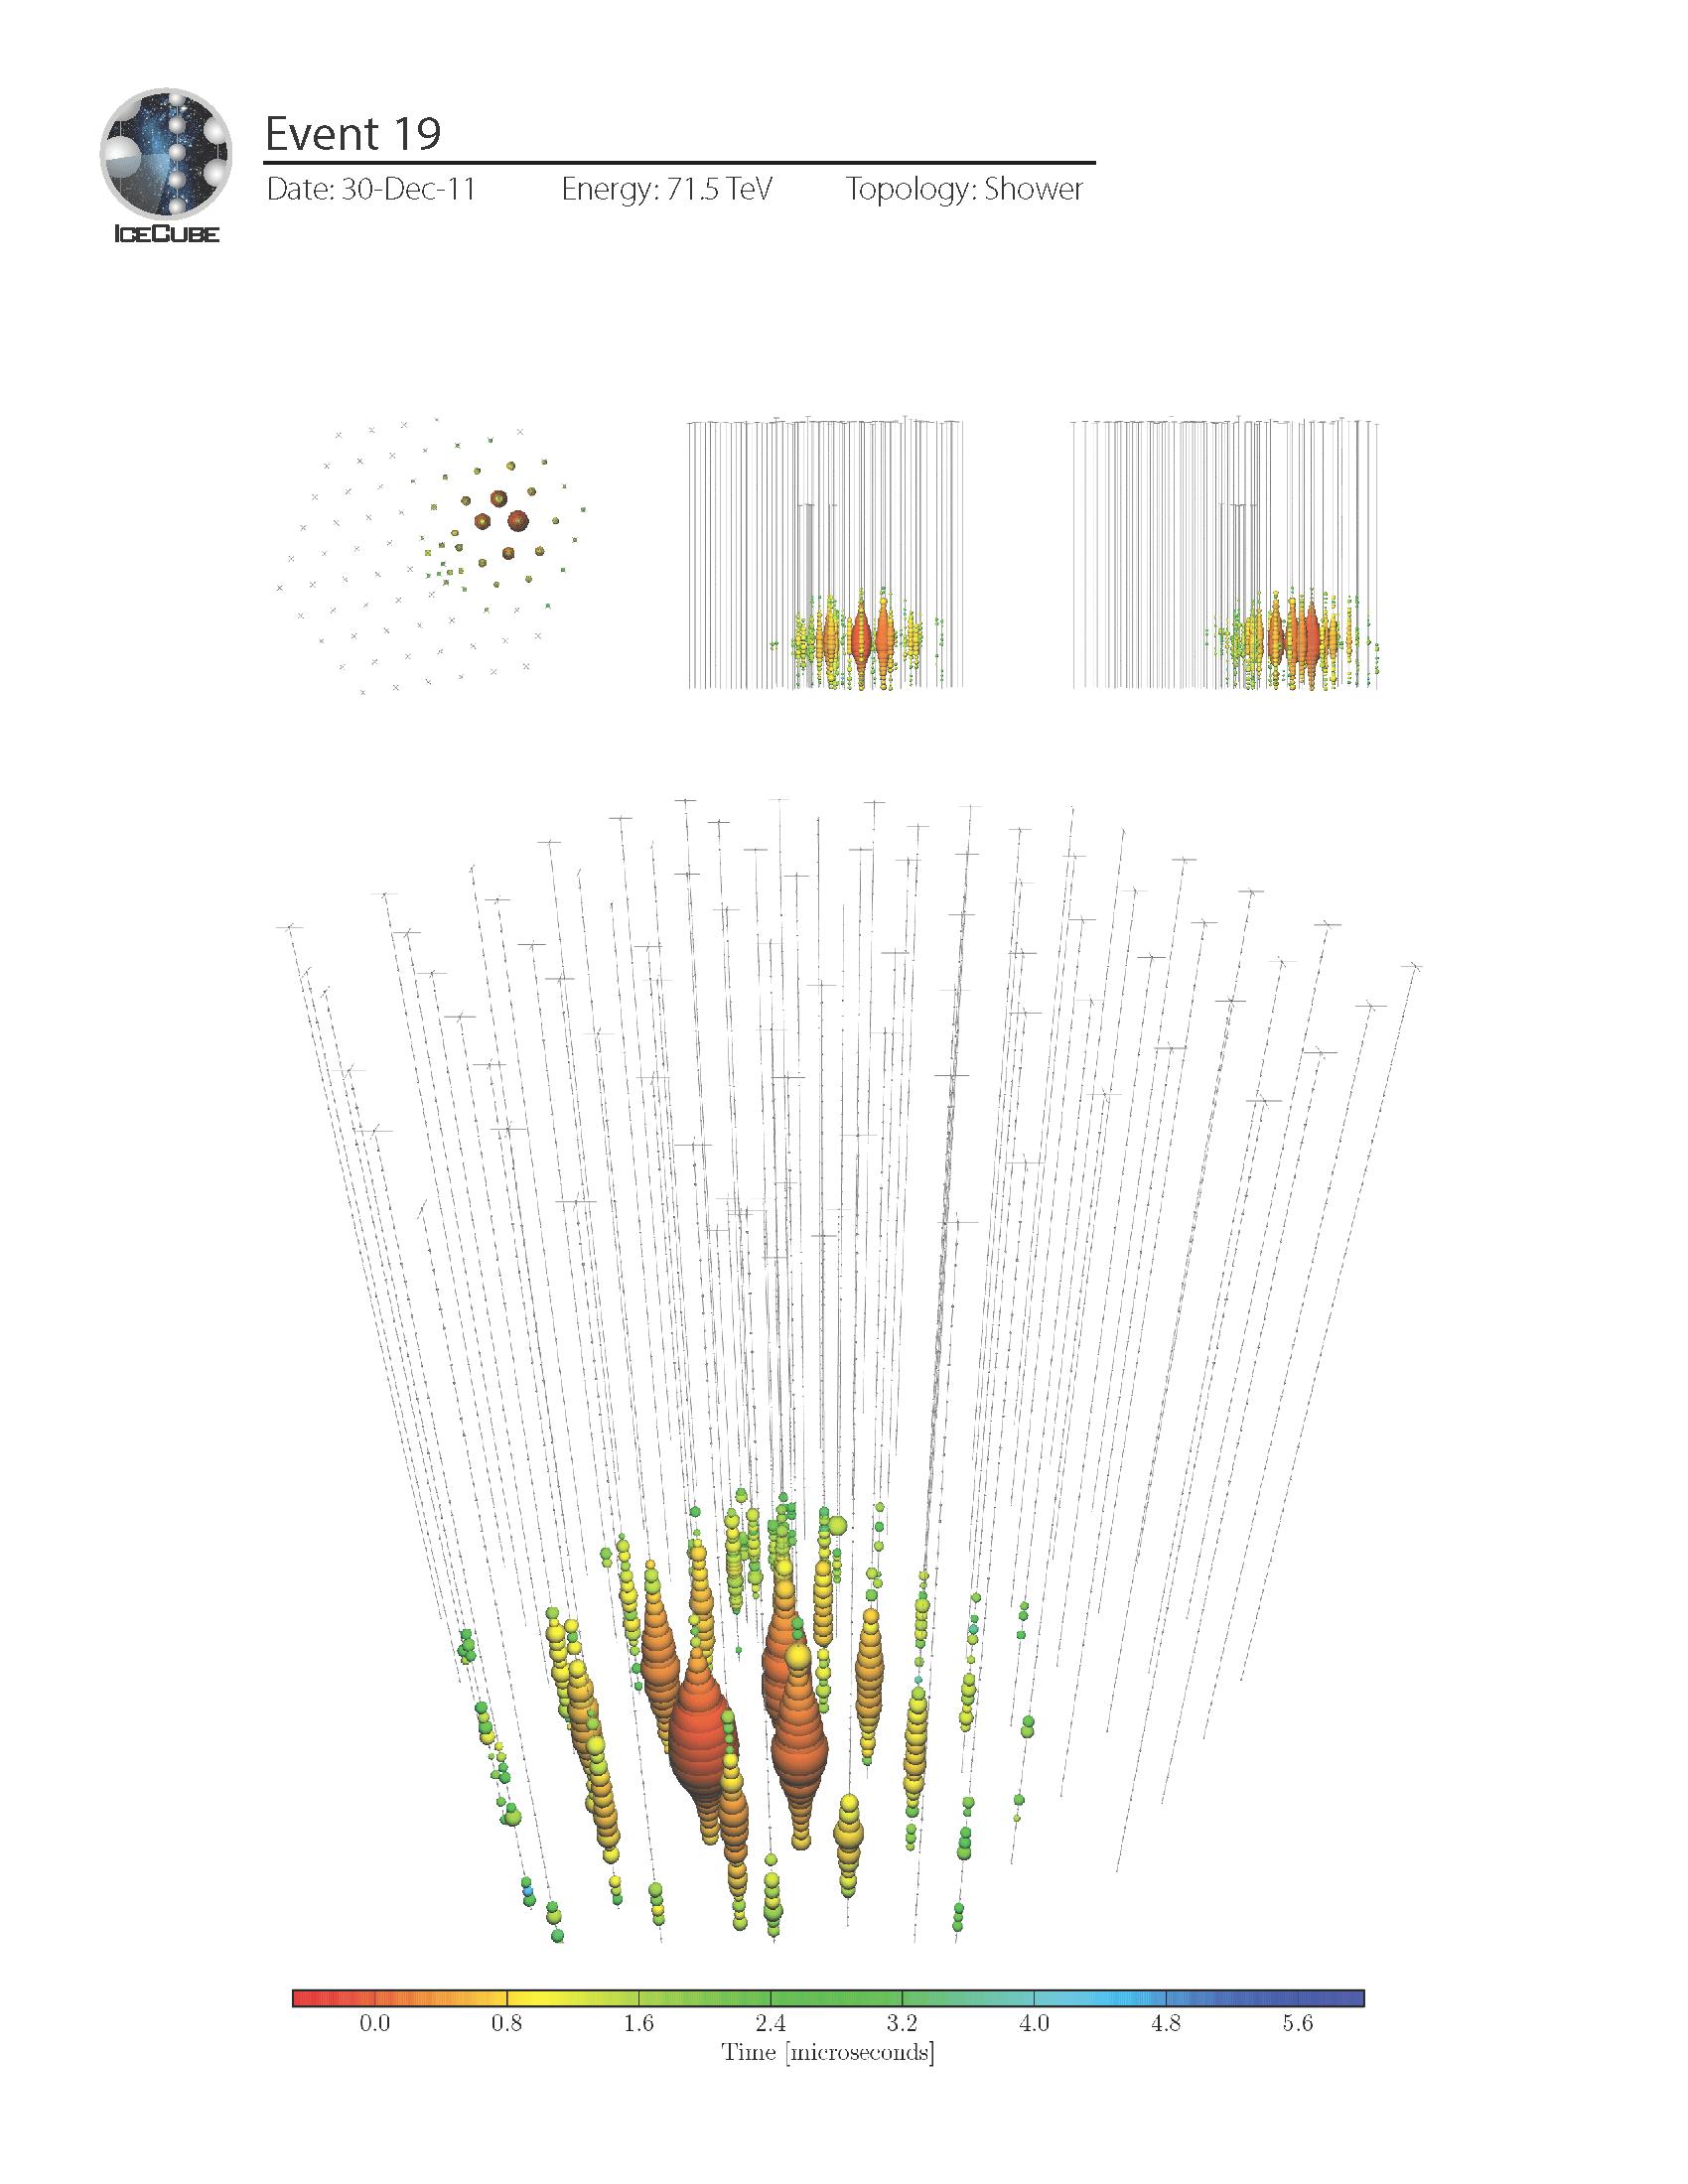 Event 19: 71.5 TeV, December 30, 2011